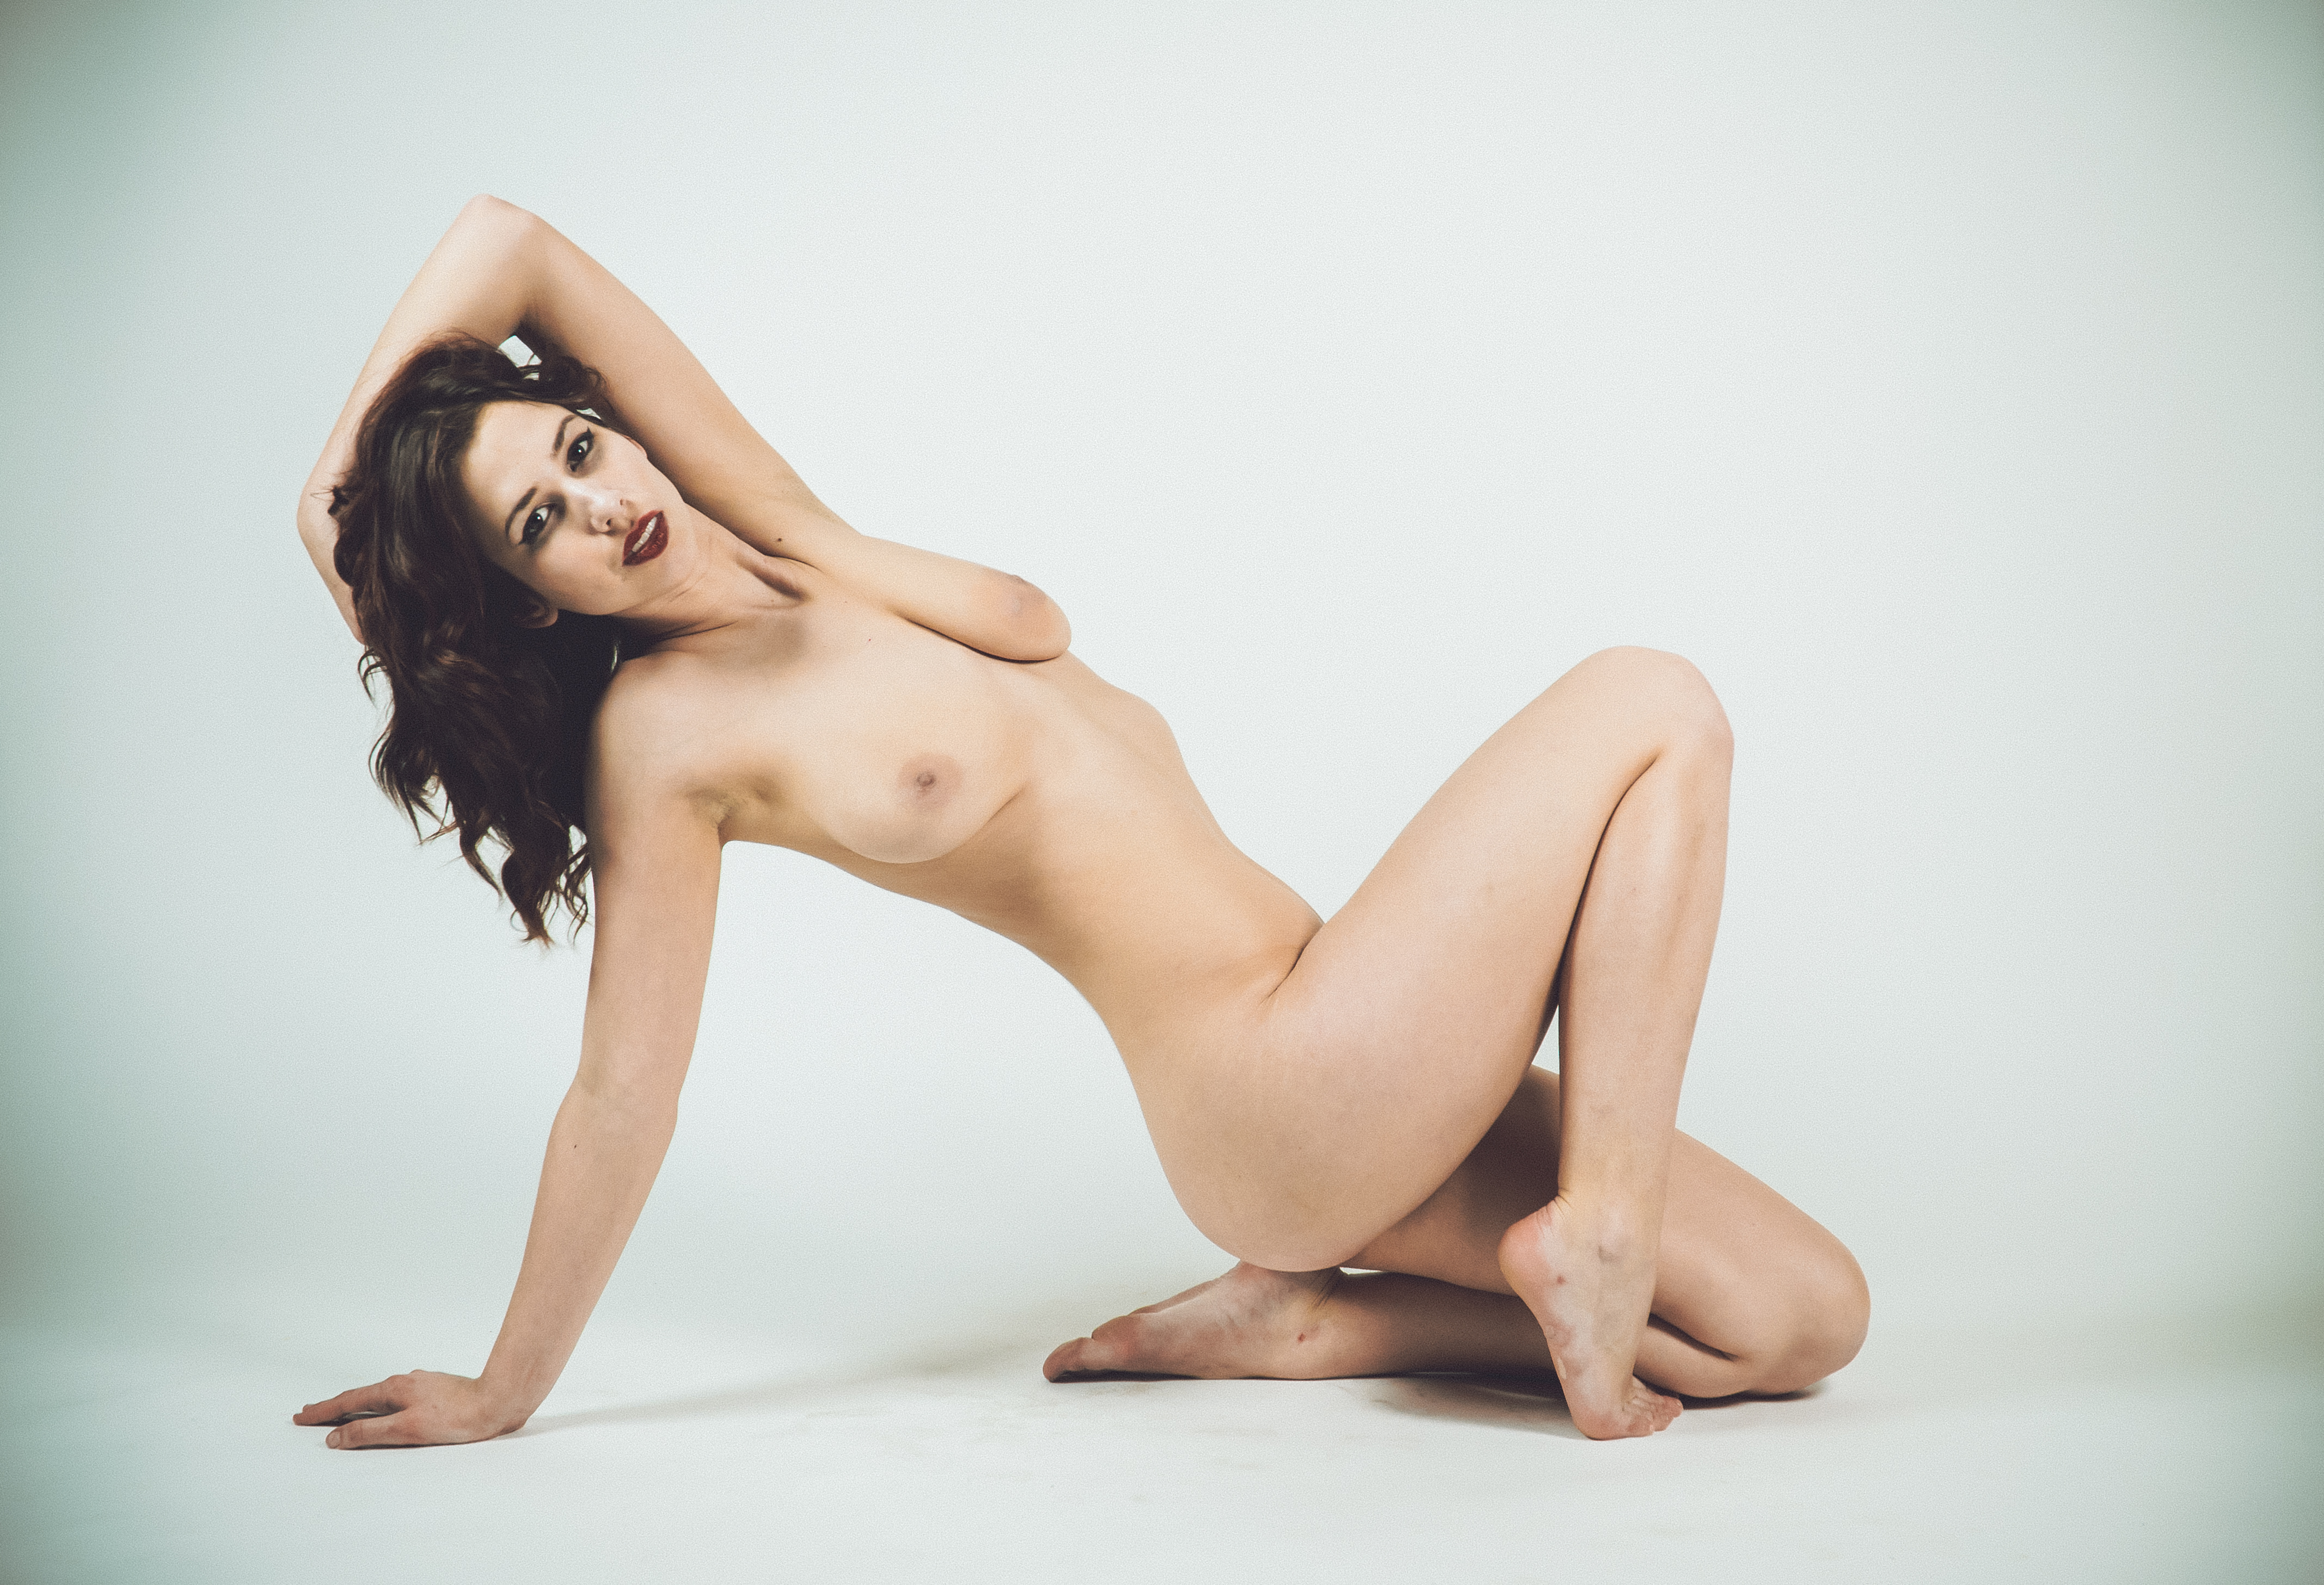 Nude_back yoga Pose